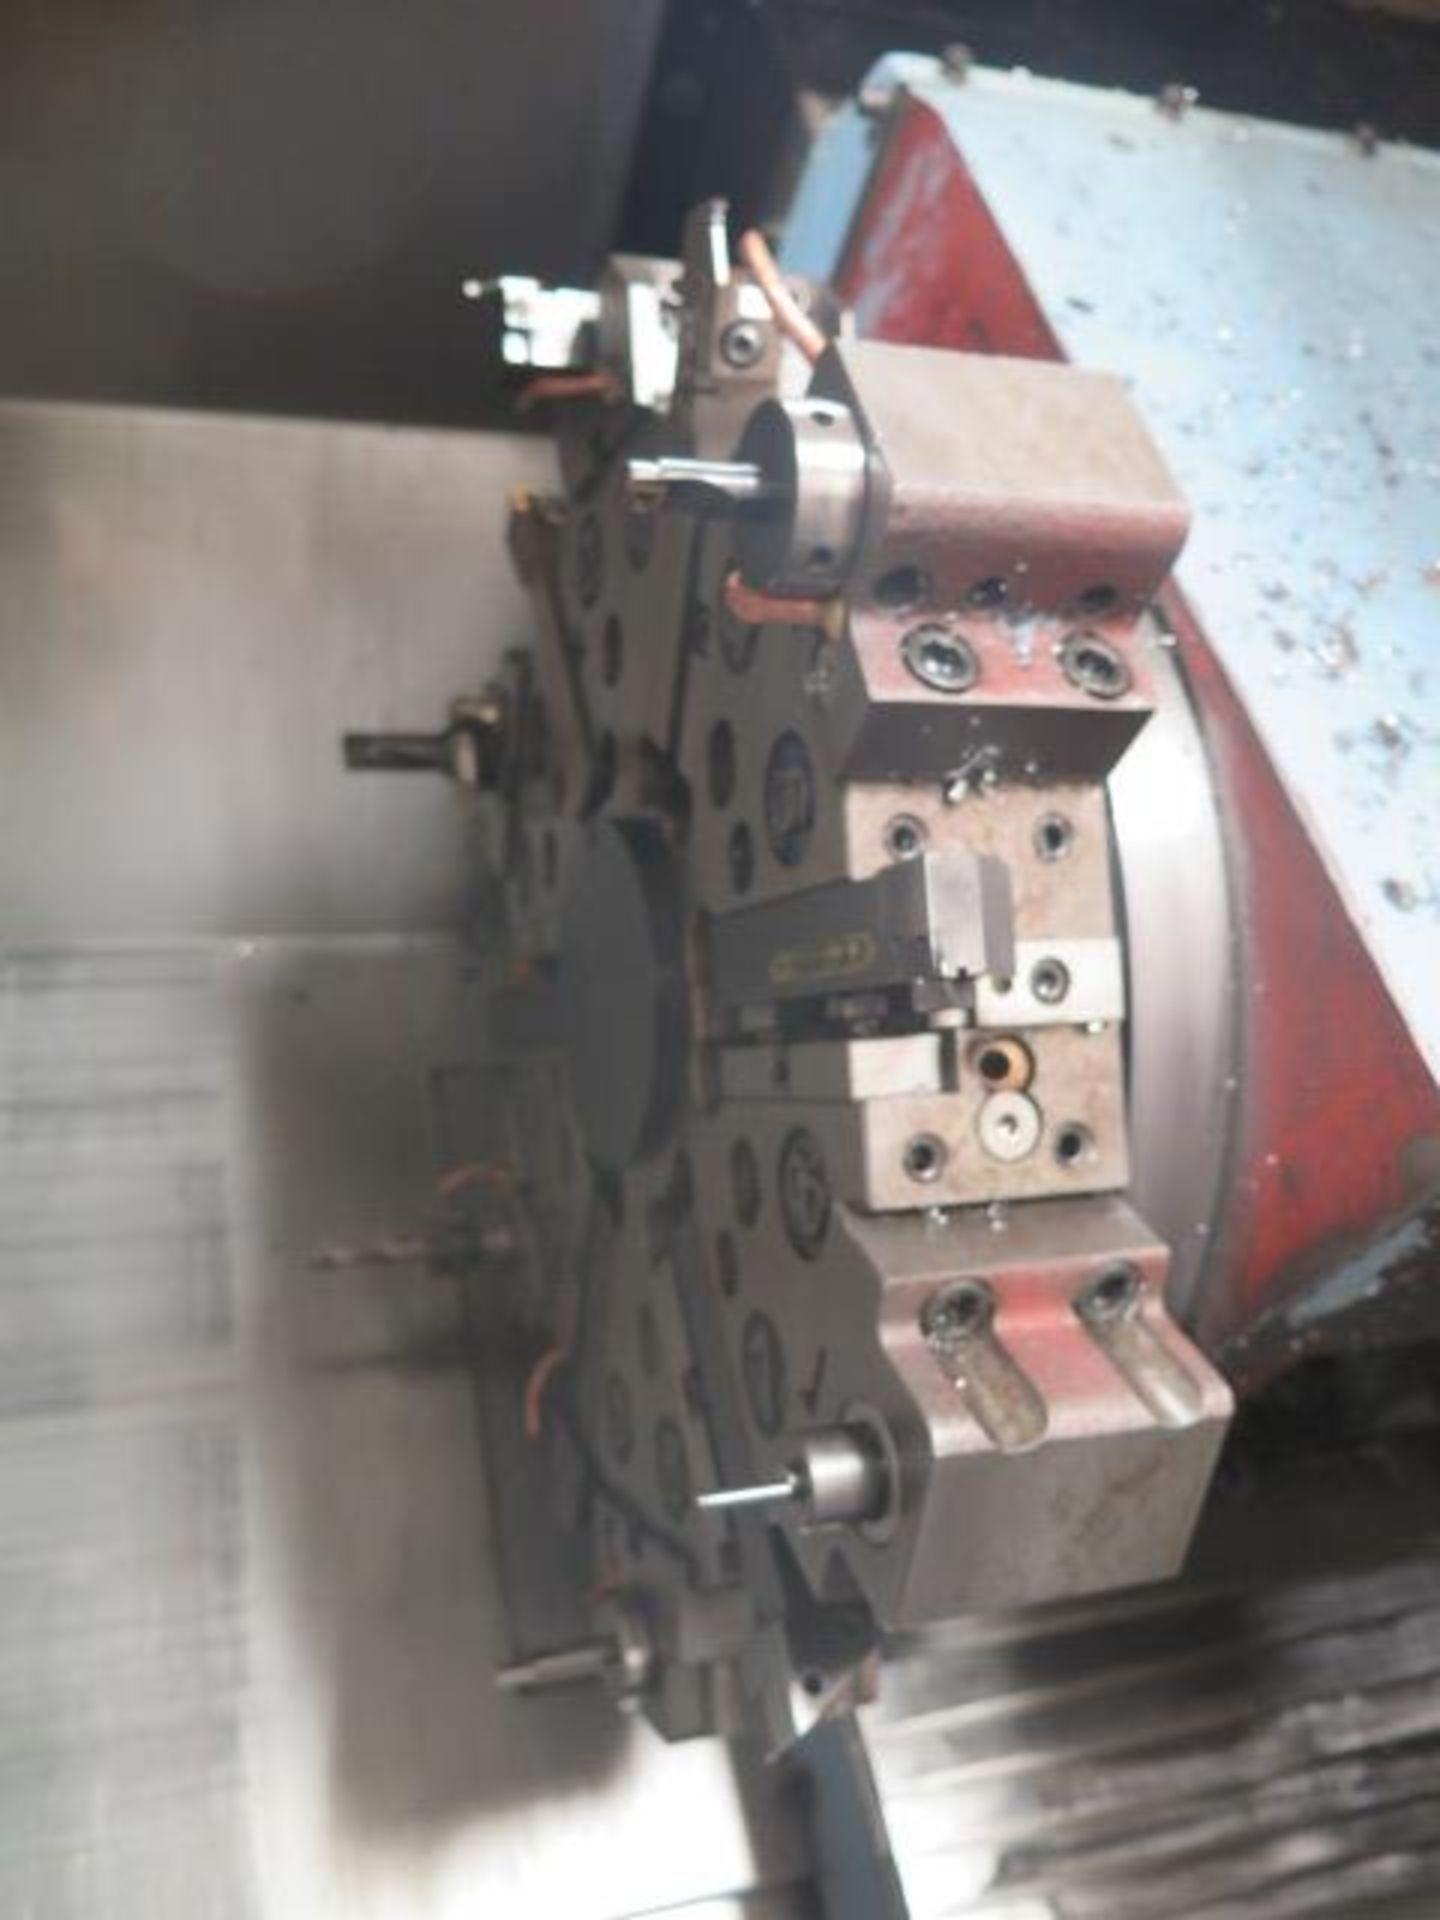 2004 Kia Super KIA Turn 15 CNC Turning Center s/n SKT150905 w/ Fanuc Series 0i-TB Contrs, SOLD AS IS - Image 10 of 16